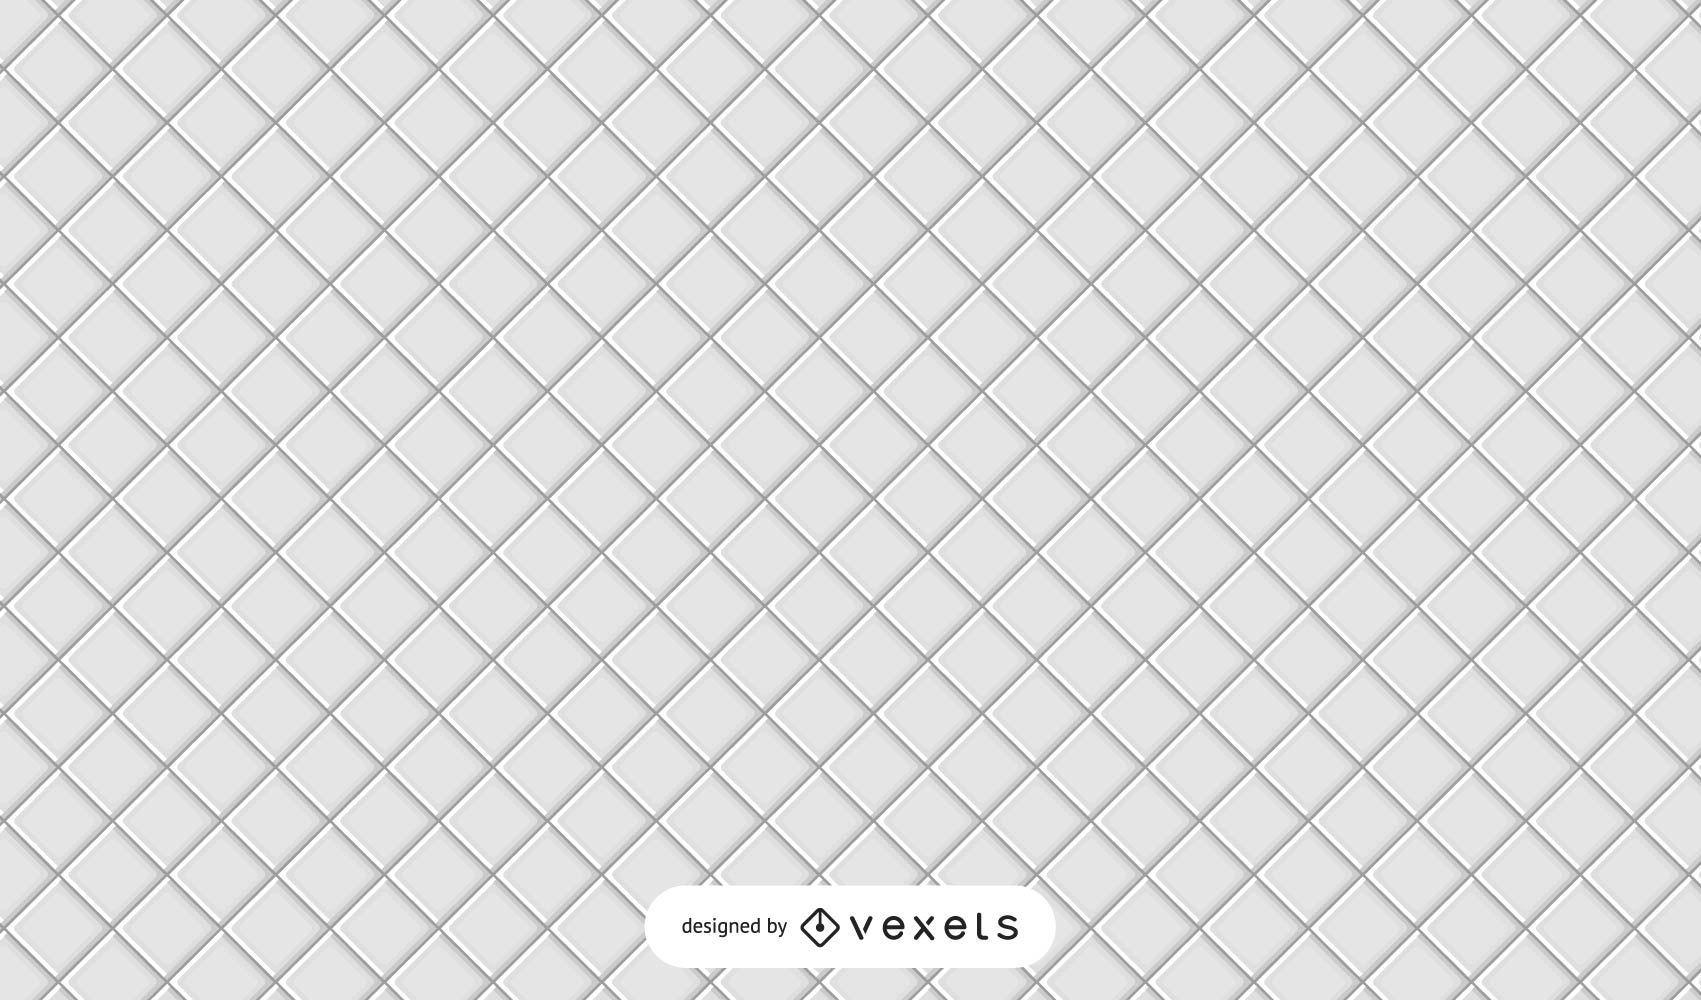 Textura blanca perfecta